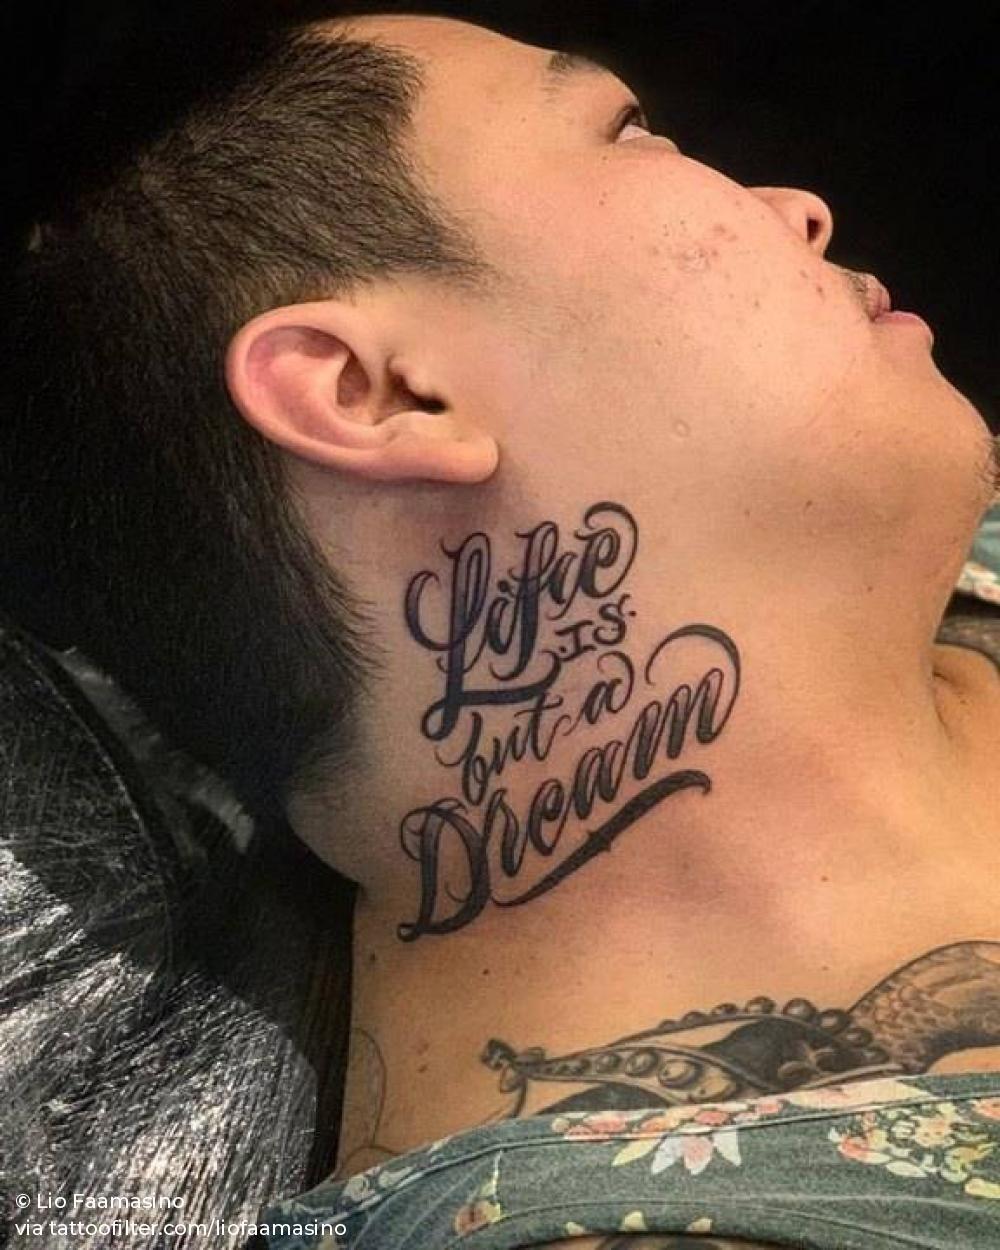 Pin De Leiliane Colares En Tattoo Tatuajes Chiquitos Tatuajes Cuello Tatuajes De Gangsters